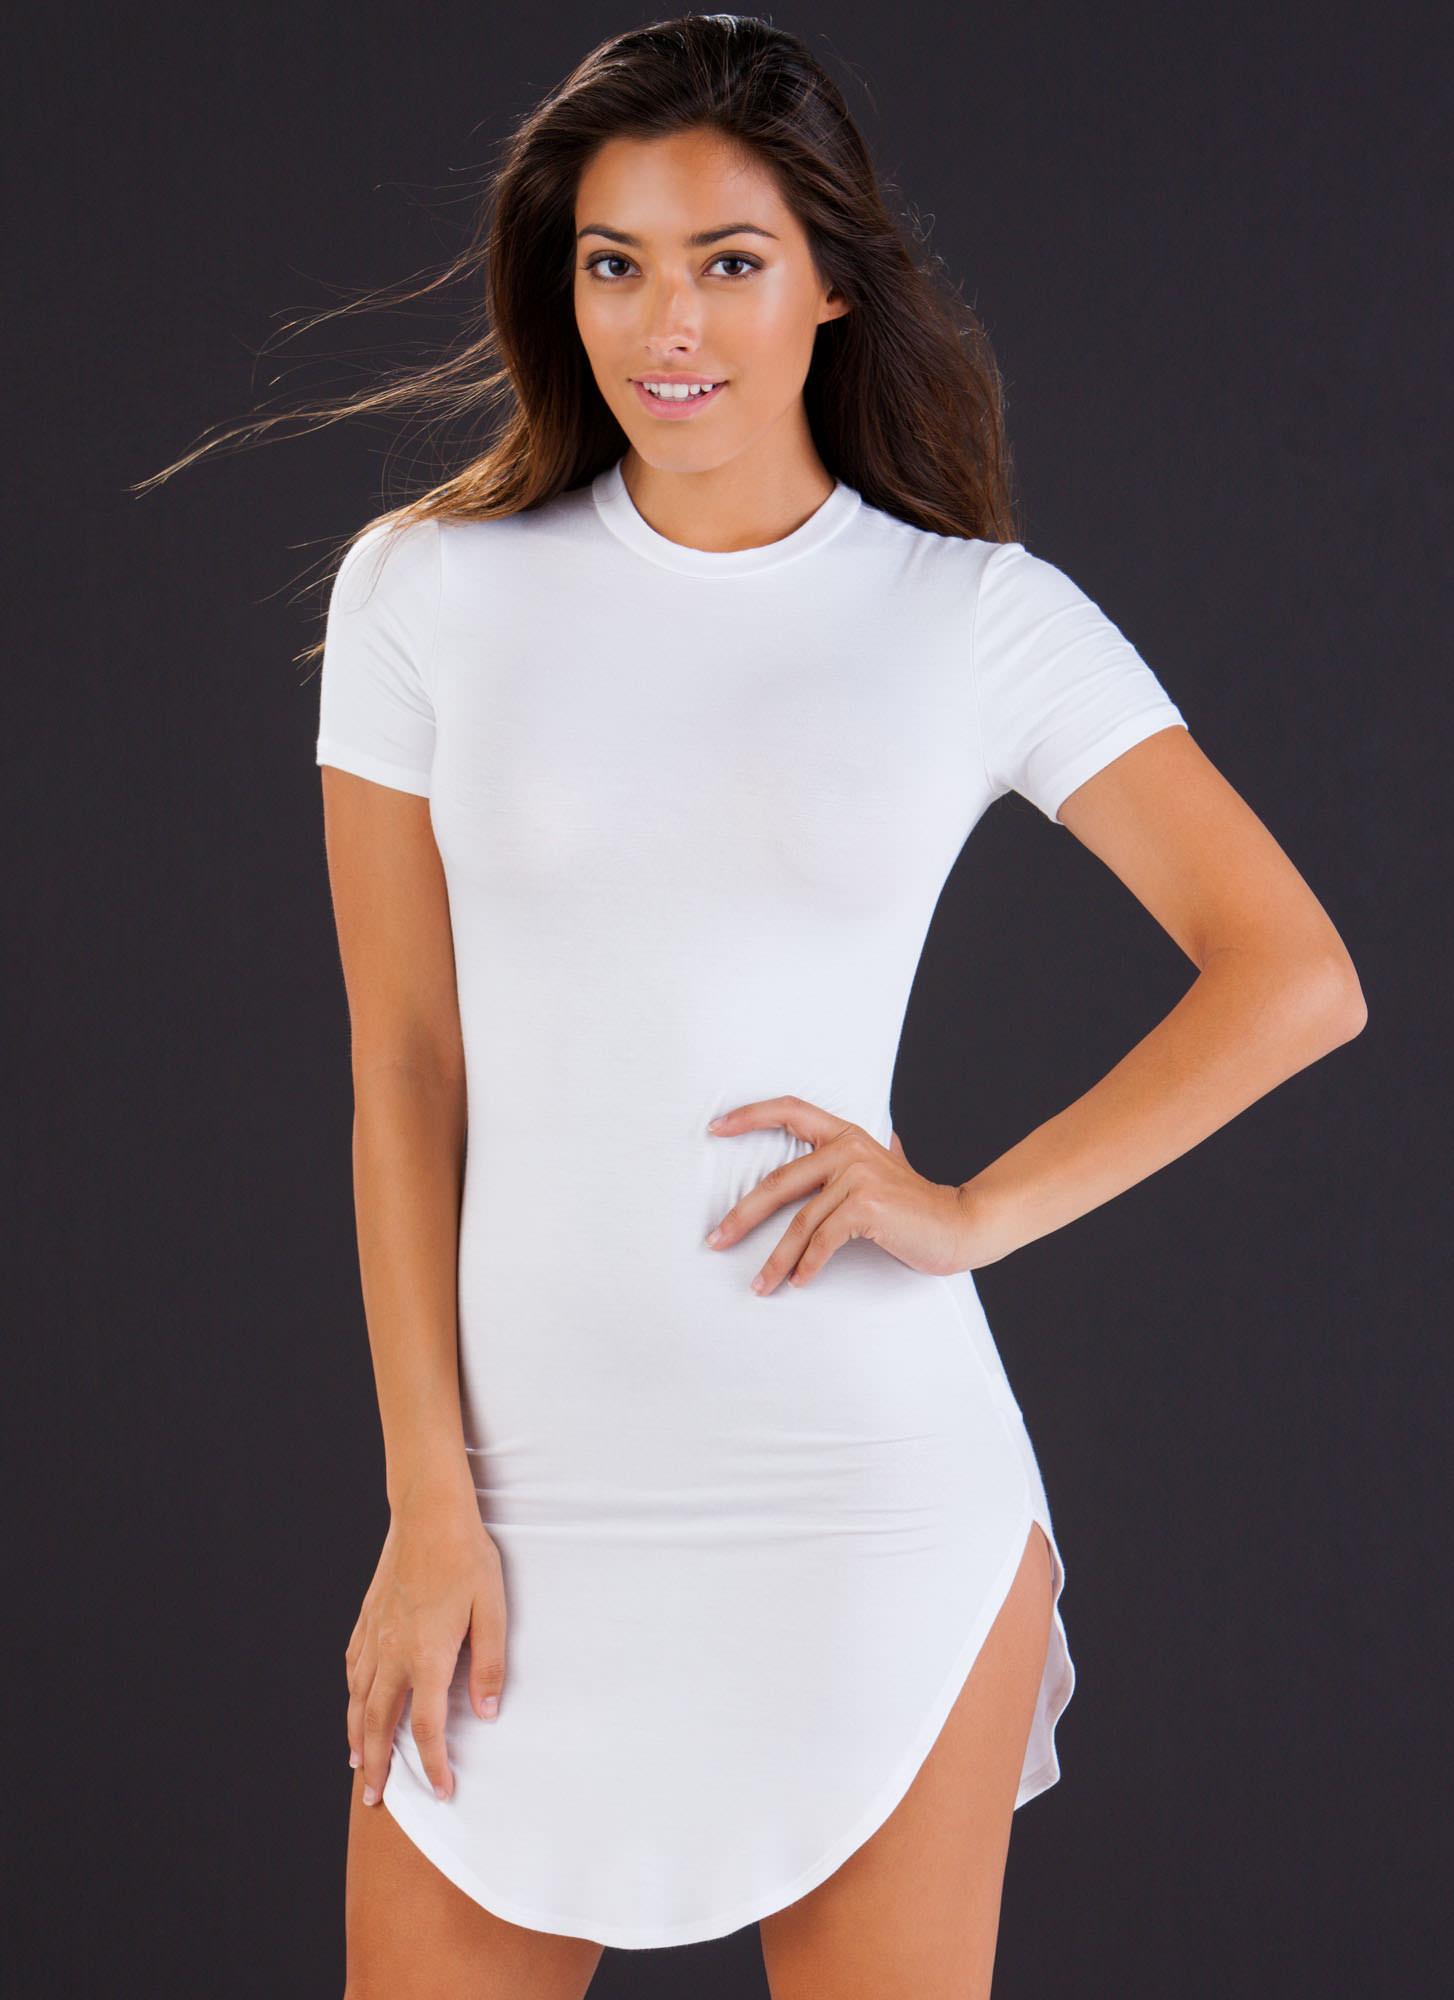 Chic Bodycon Dress ROYAL MUSTARD WHITE BLACK HUNTERGREEN - GoJane.com